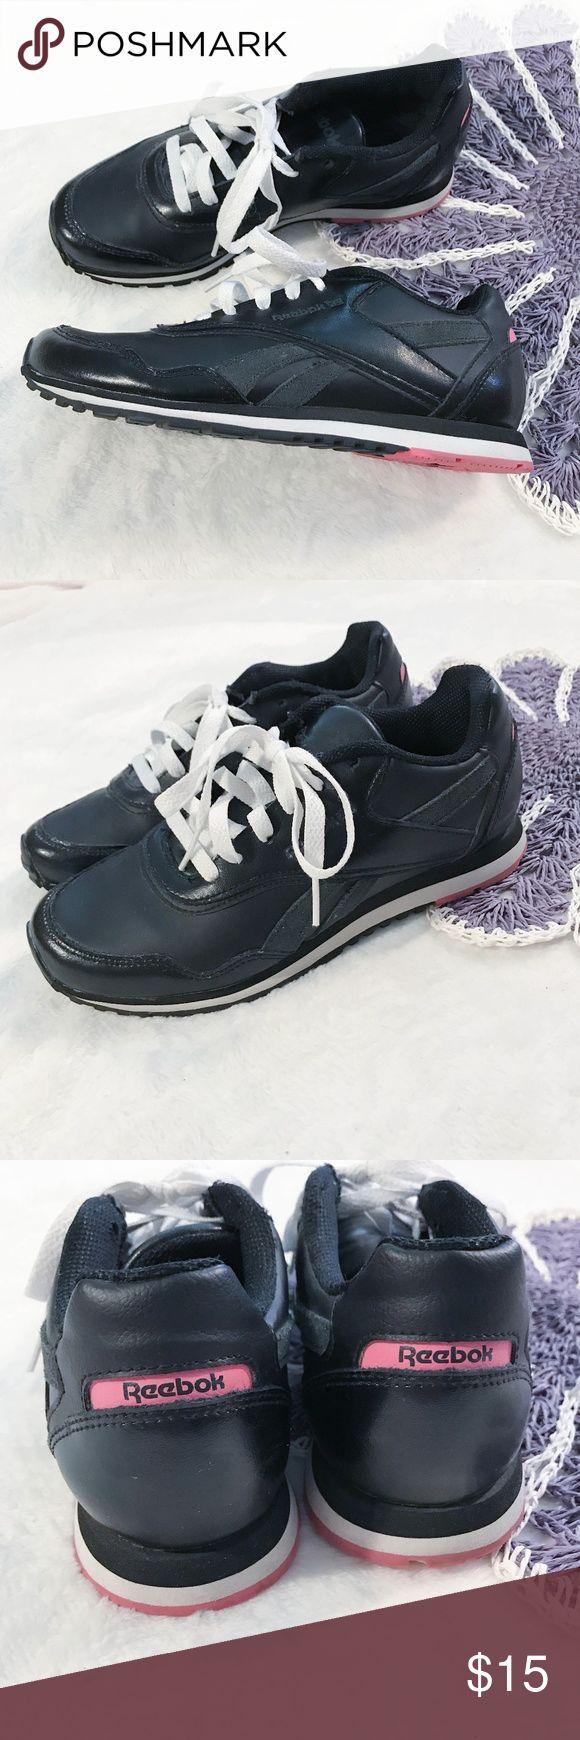 43fb65f2c3e ... Reebok Black   Pink Sneakers ...